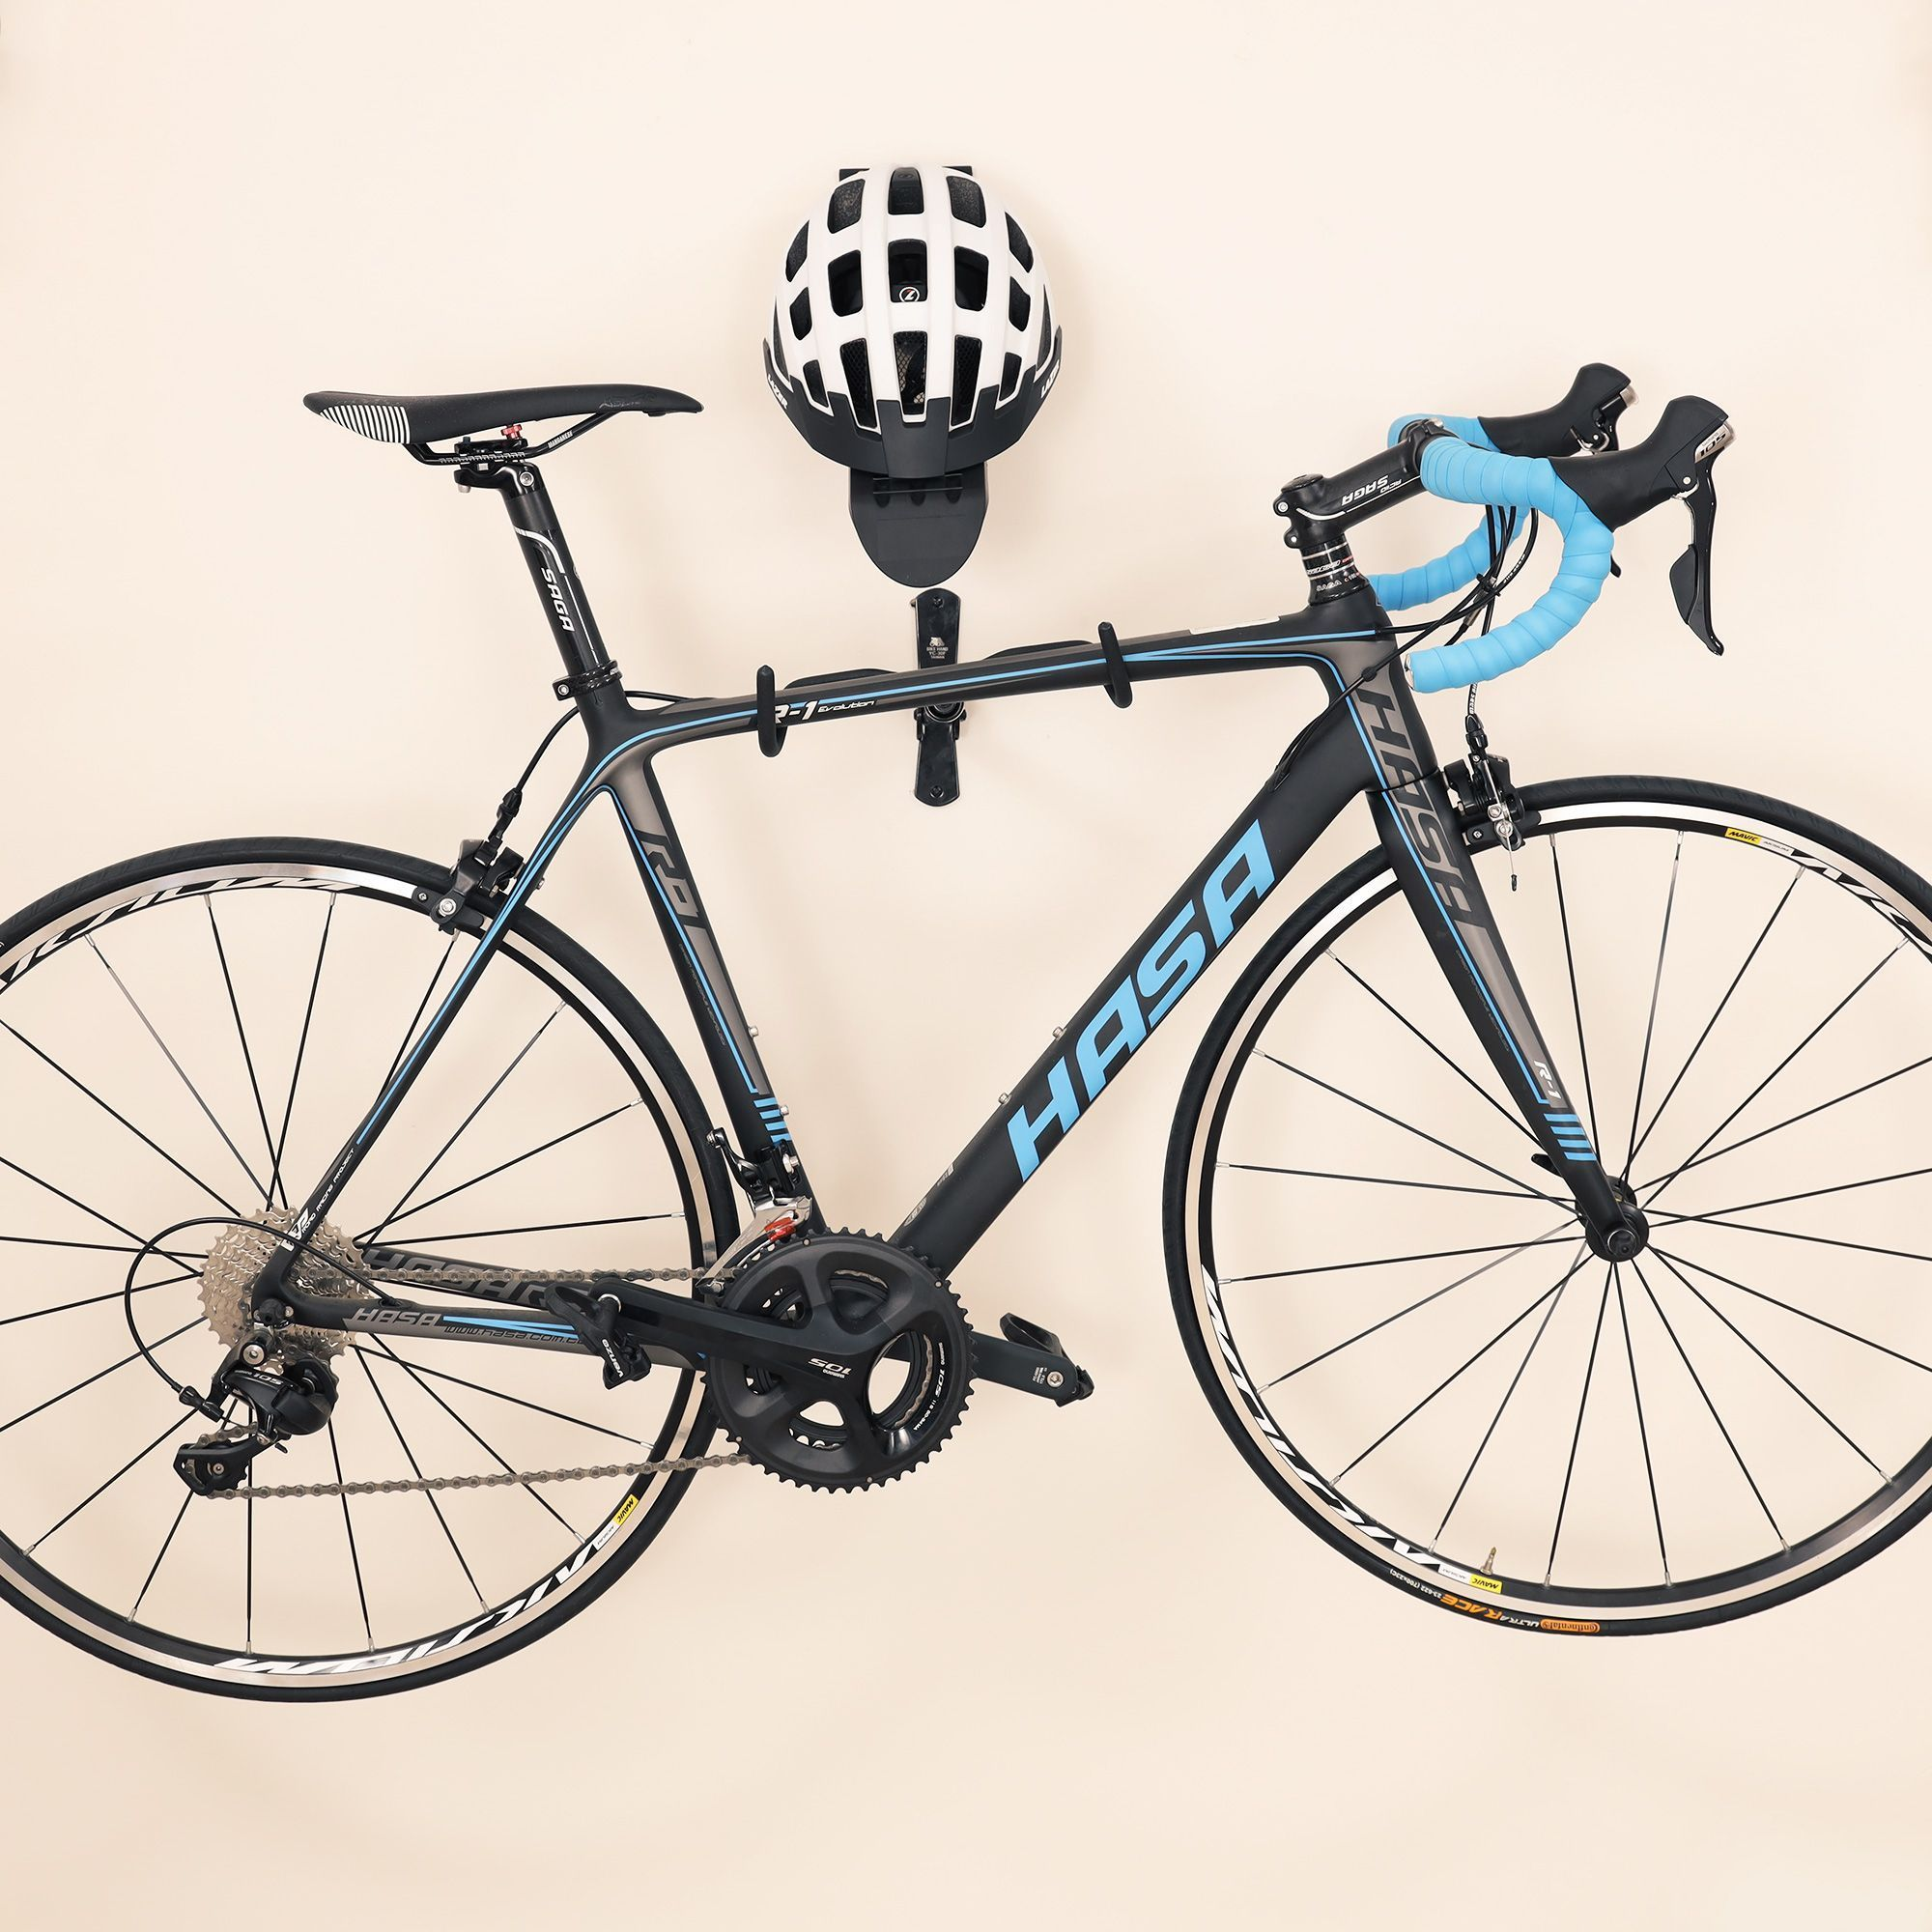 Buy Bicycle Storage Rack Wall Mounted Bike Hanger Hook Bicycle